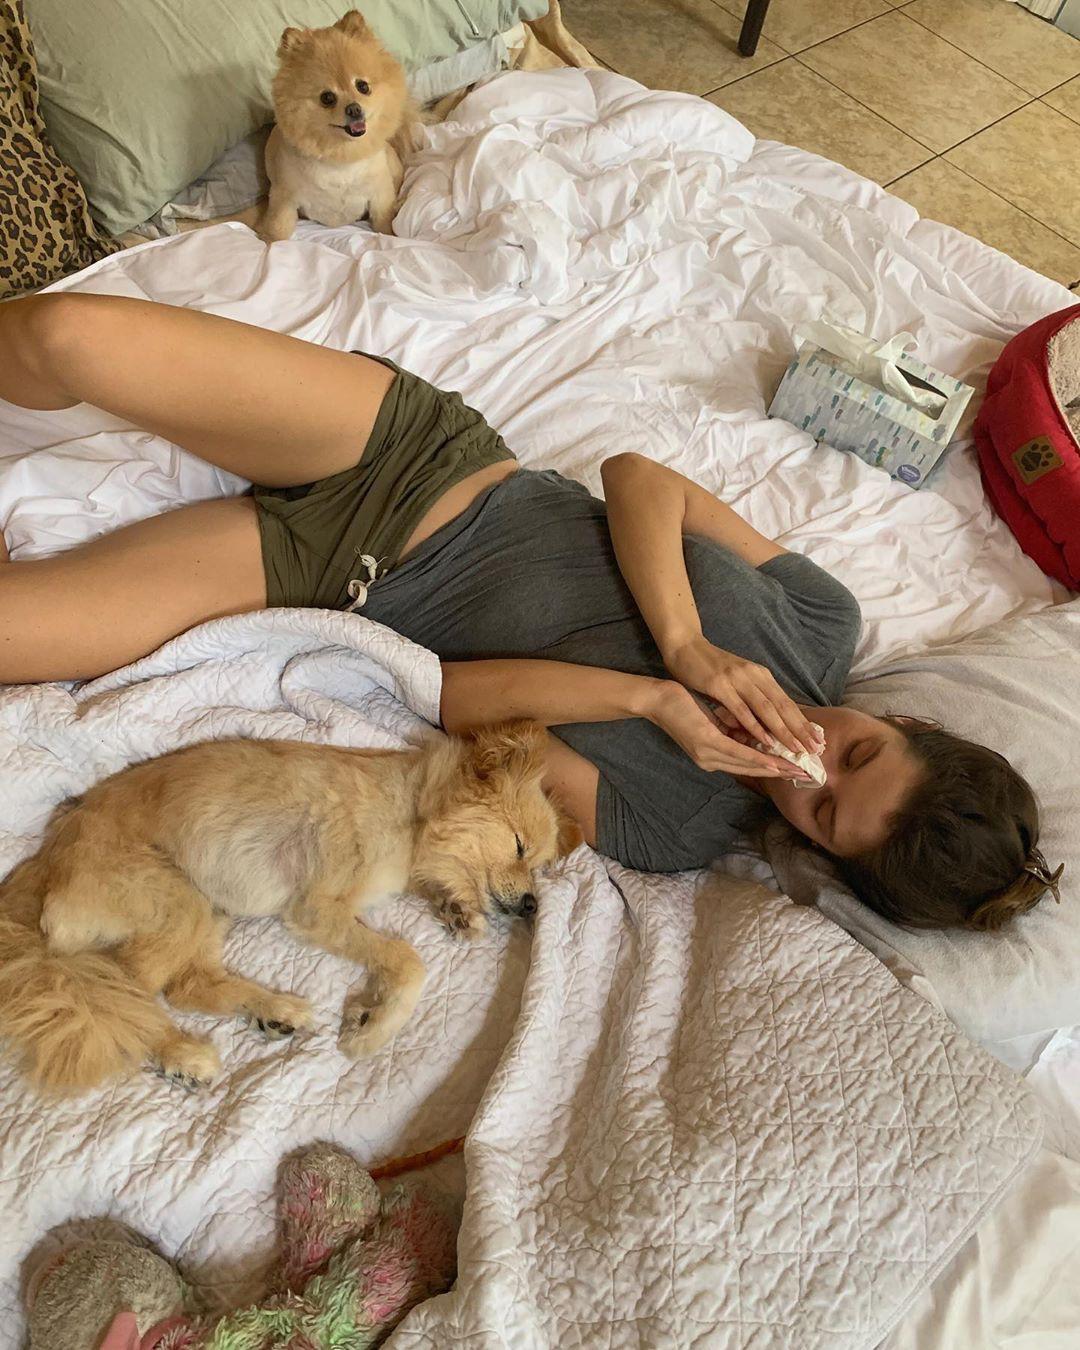 Amanda Cerny Hot Photos, Playboy Playmate, Amanda Cerny